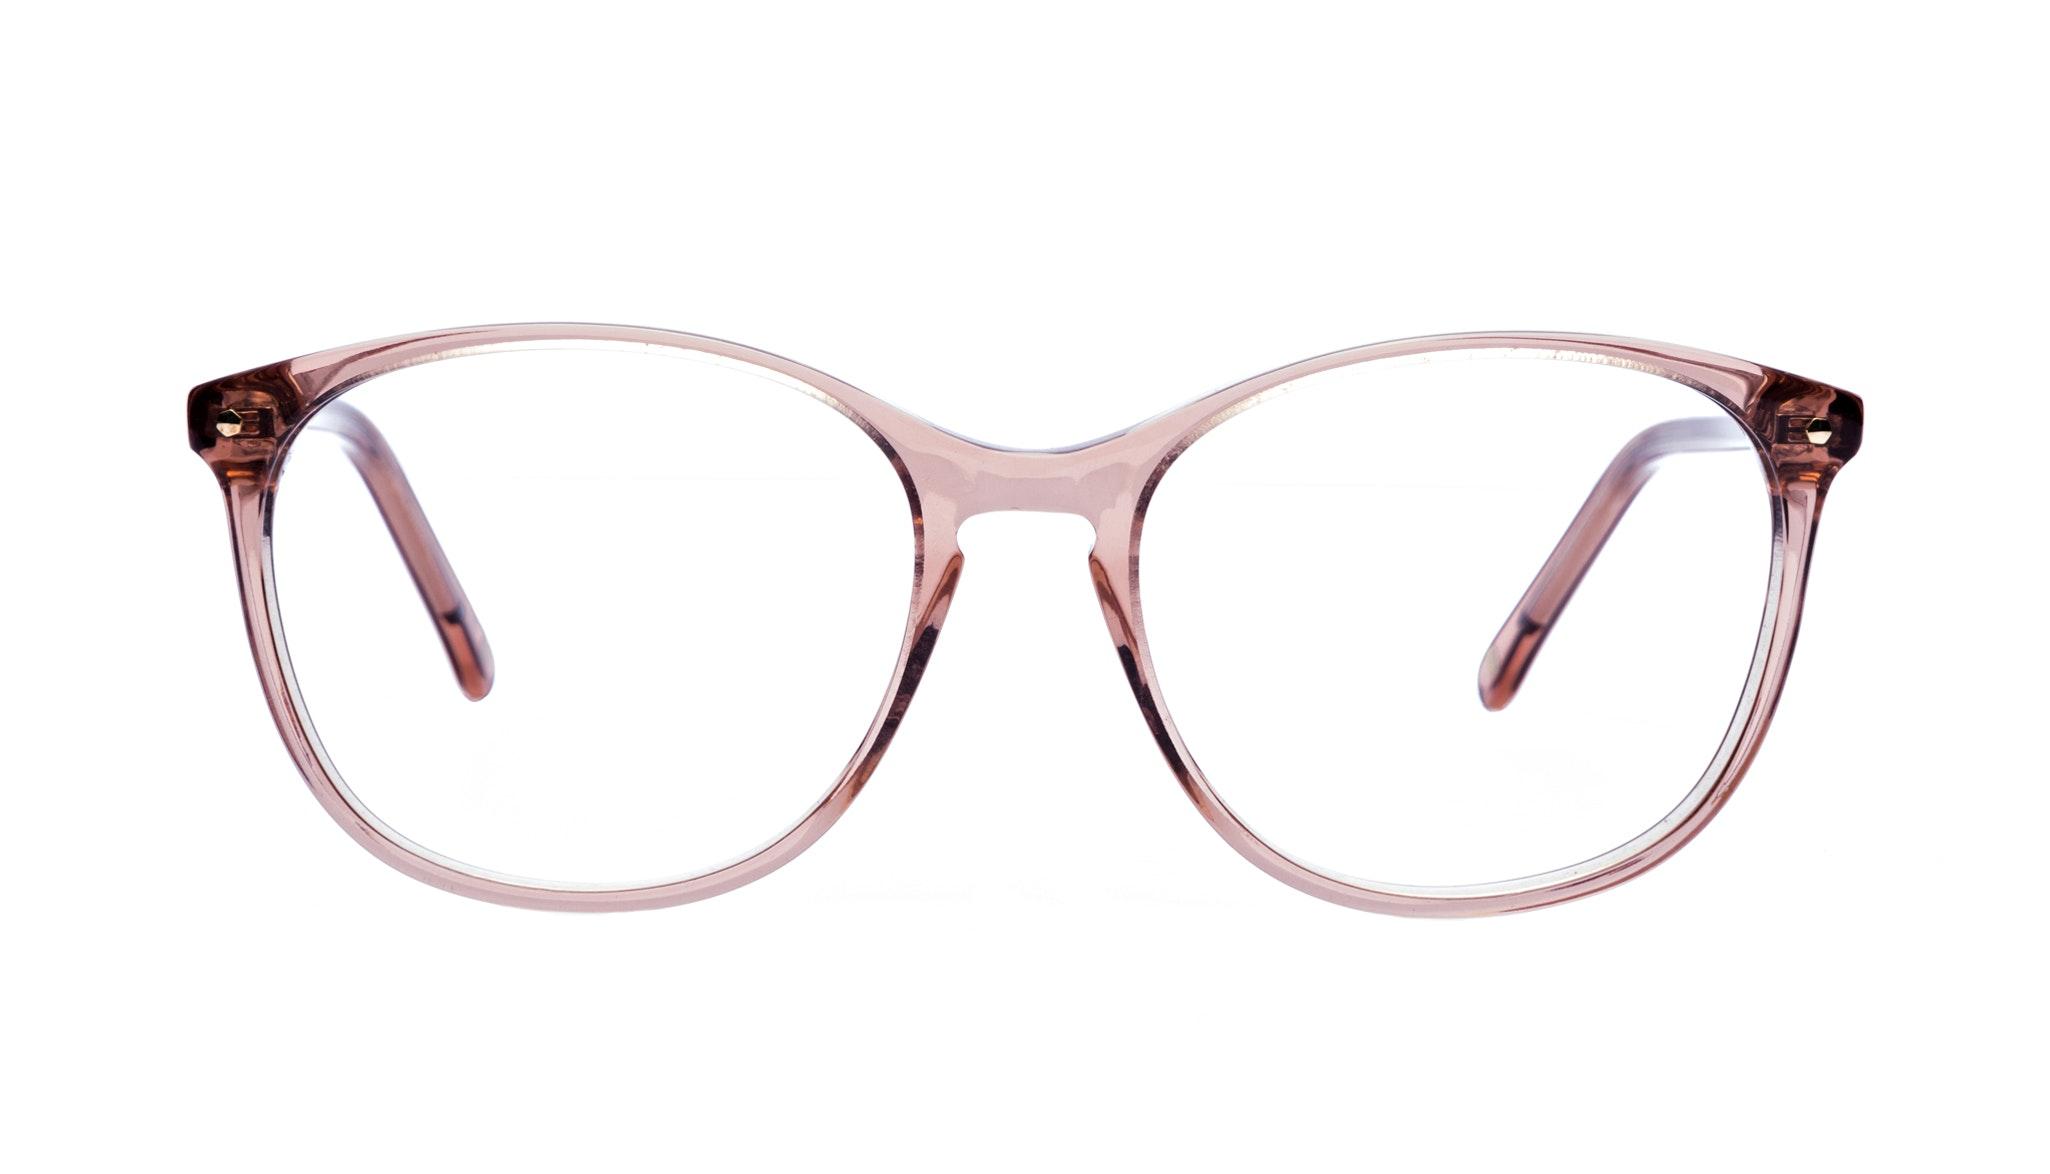 Affordable Fashion Glasses Rectangle Square Round Eyeglasses Women Nadine Rose